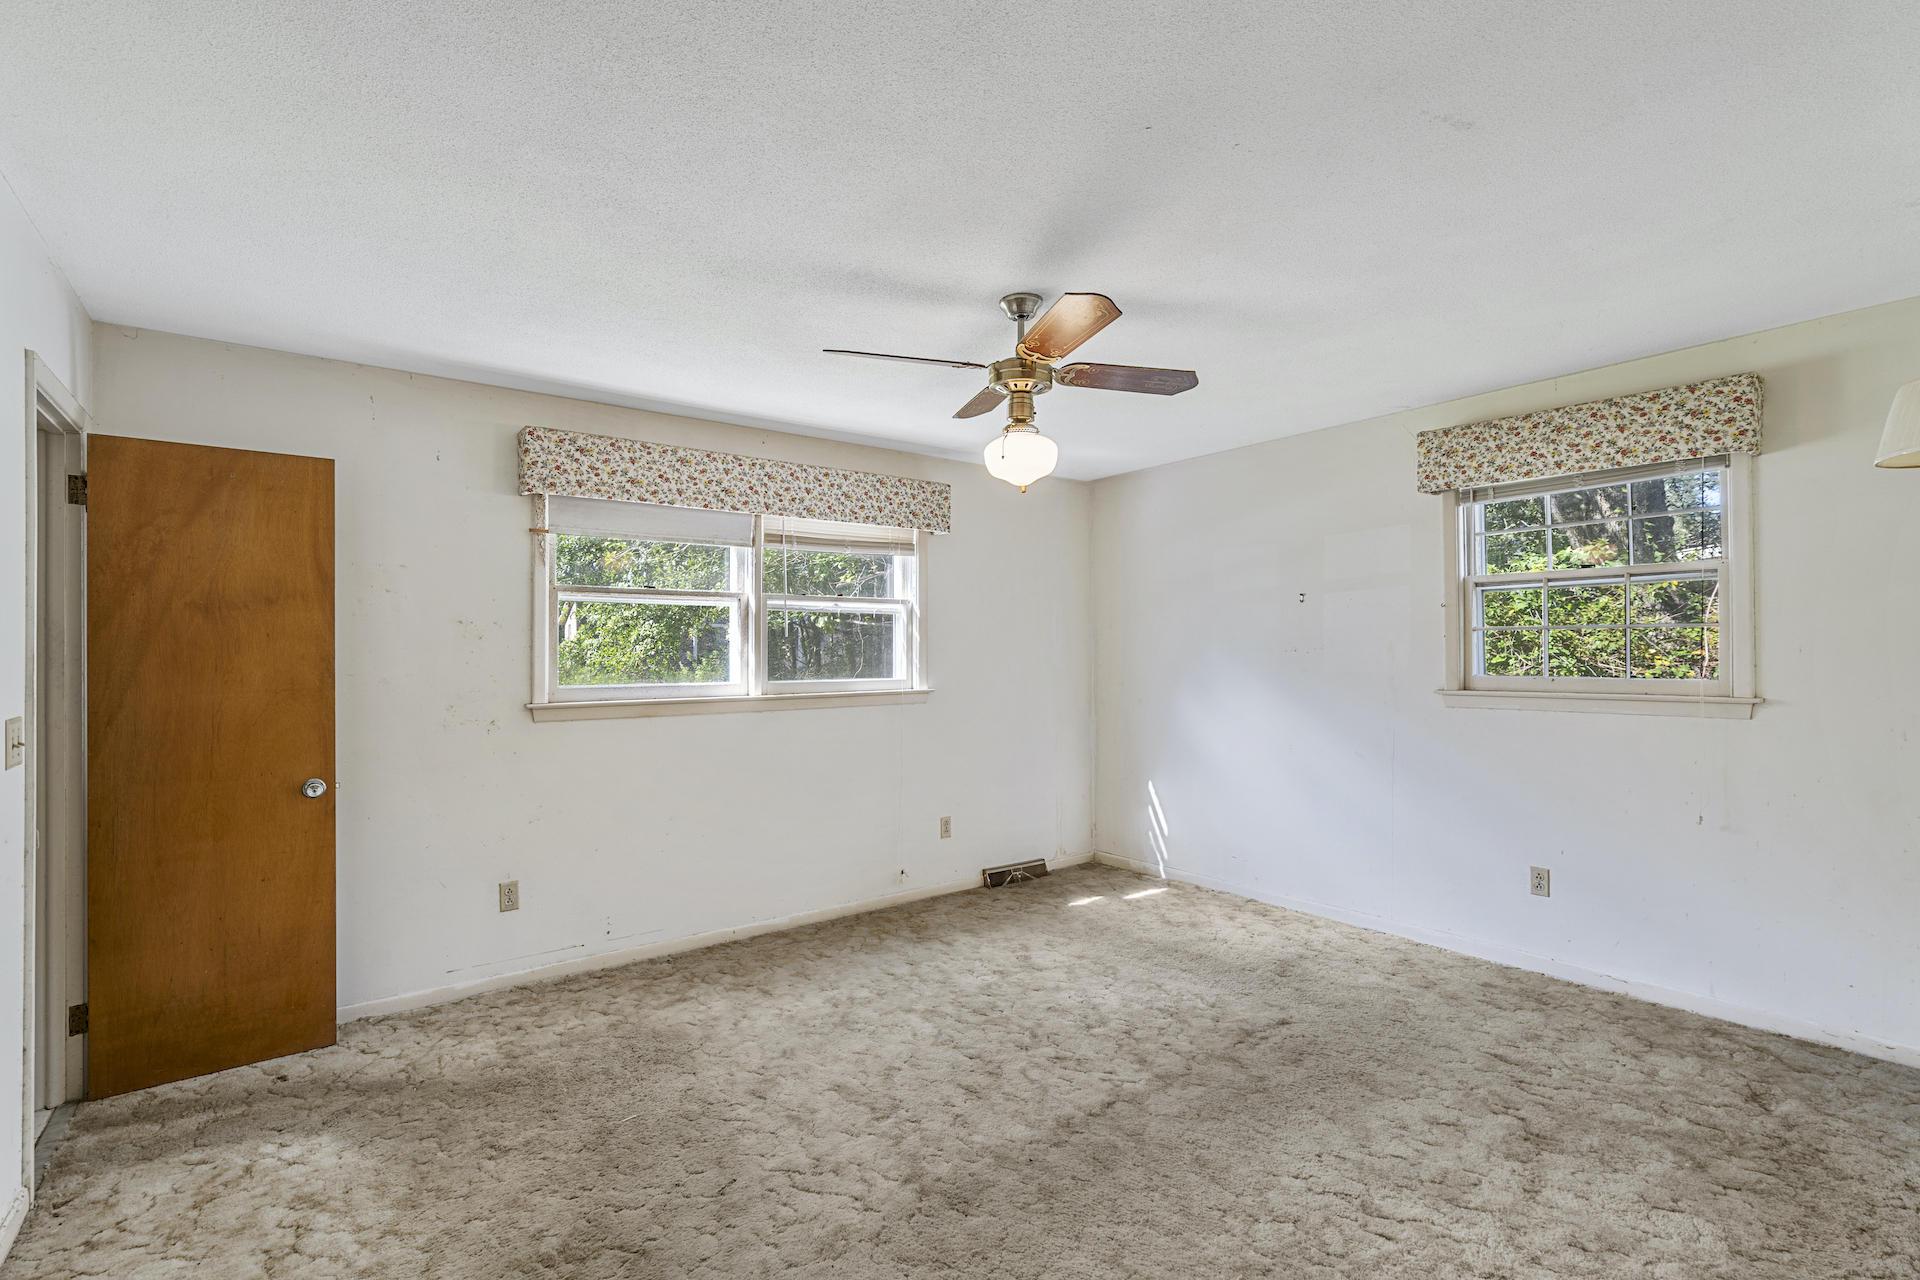 Charlestowne Estates I Homes For Sale - 1137 Culpepper, Charleston, SC - 16